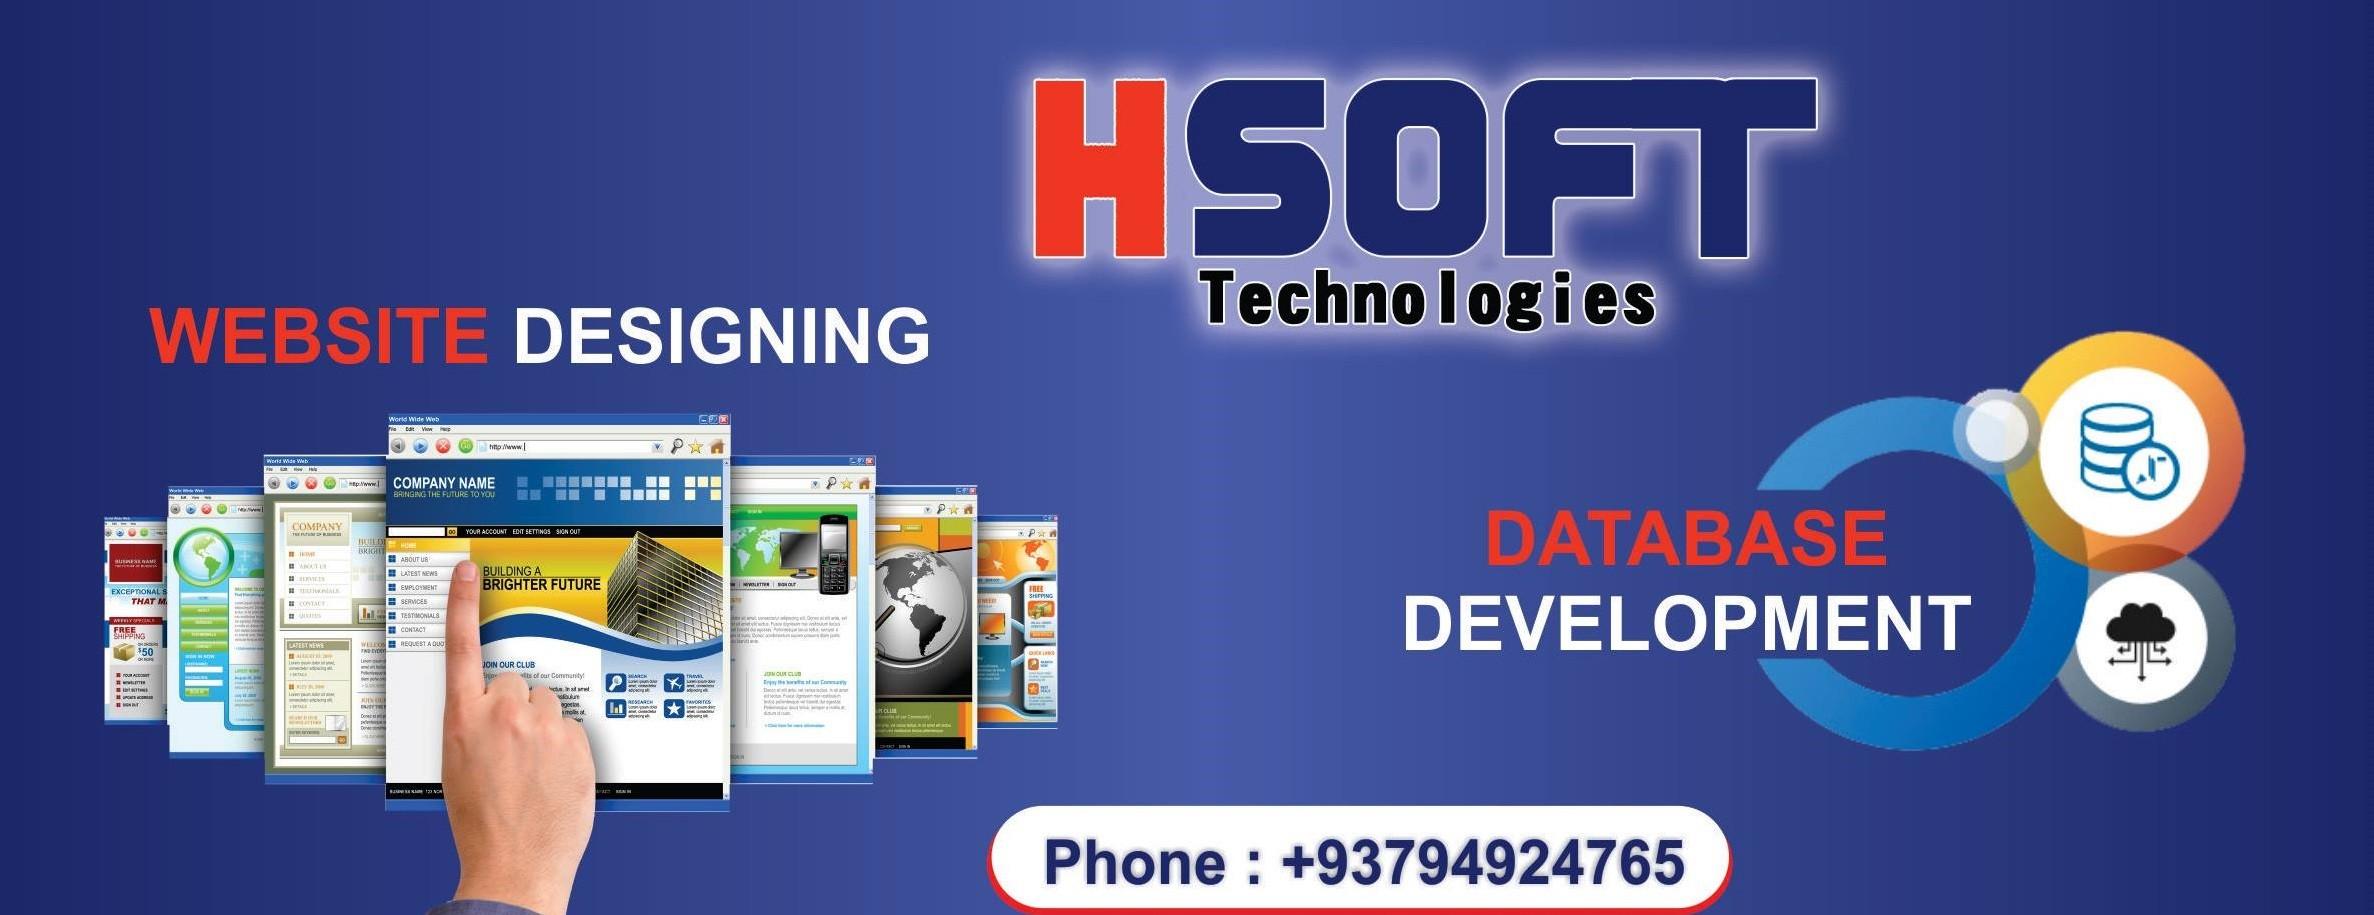 HSOFT Technologies Software Development company, University